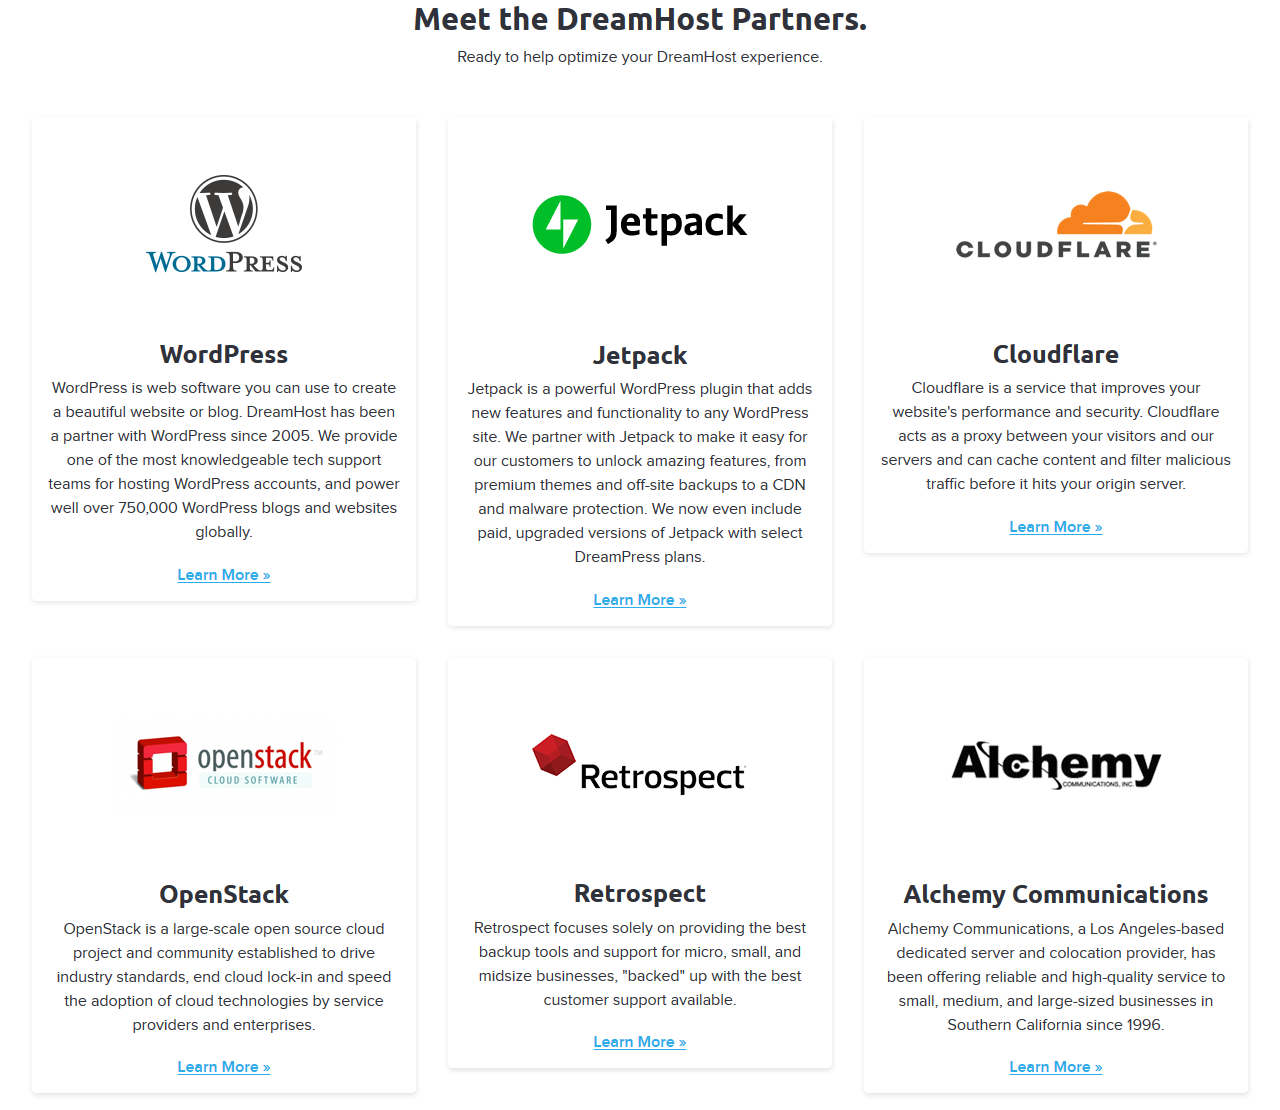 DreamHost Partners